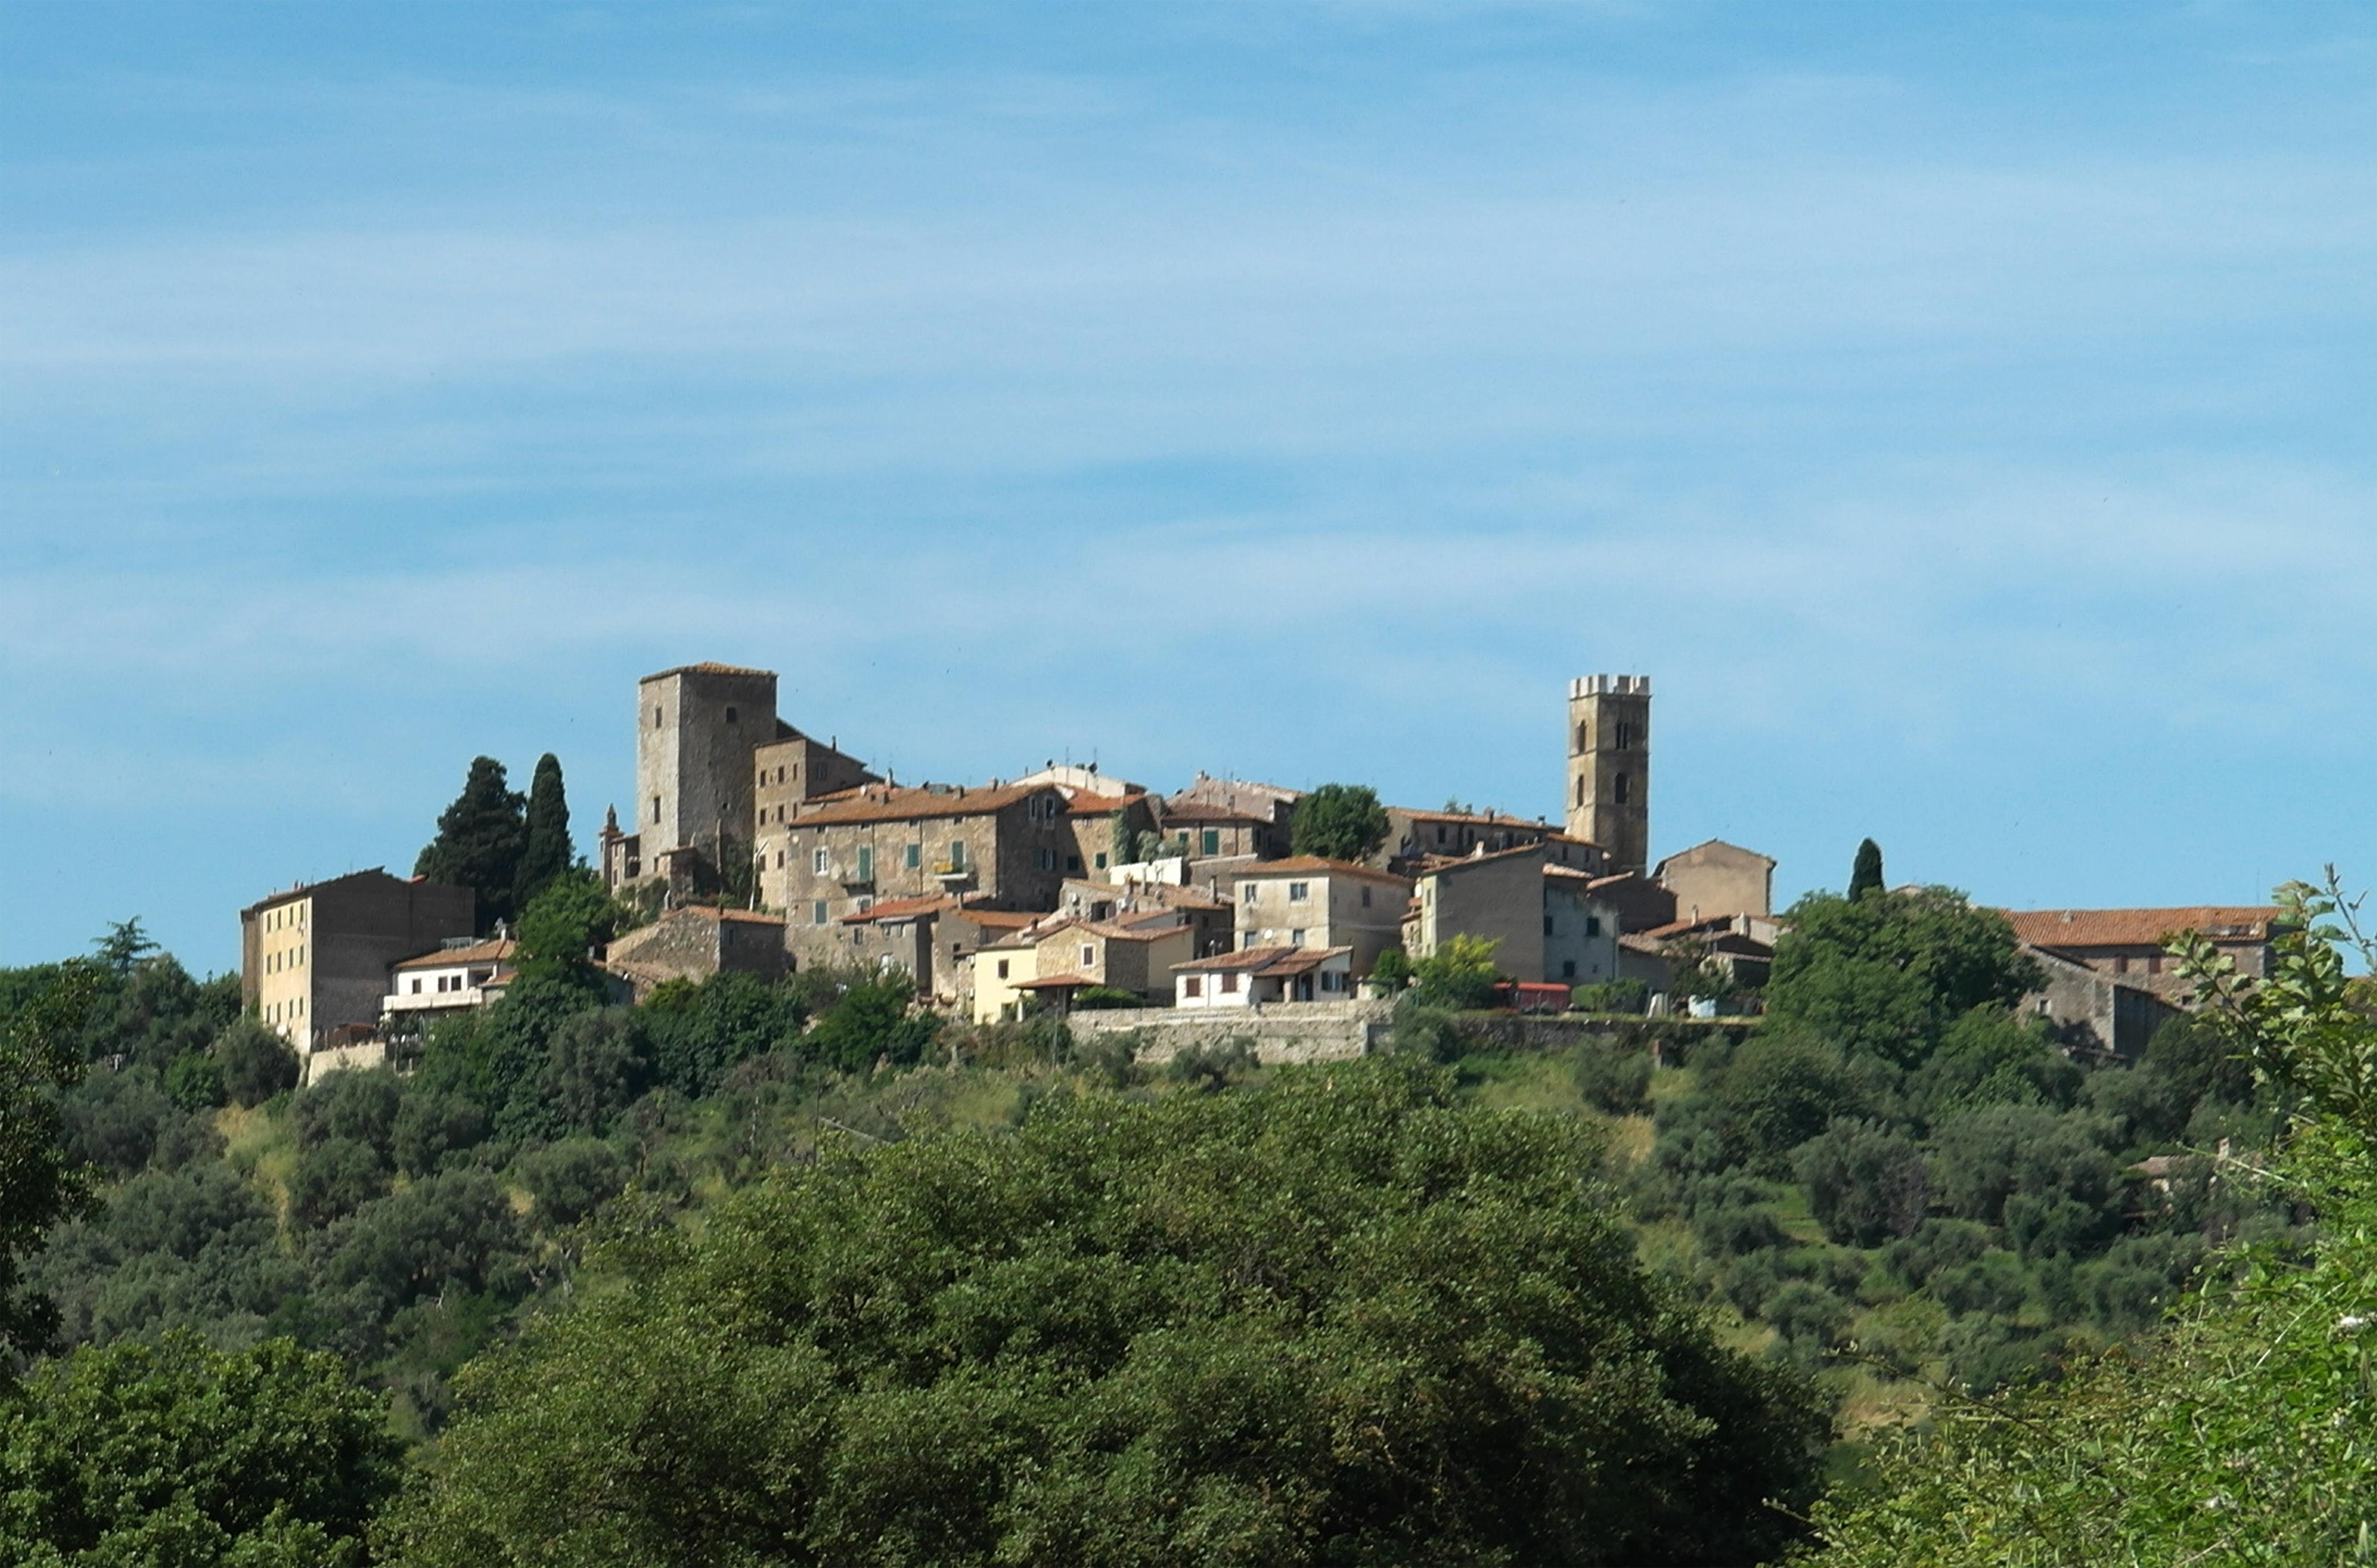 Montemerano, Manciano, Grosseto, Tuscany, Italy - panoramio.jpg